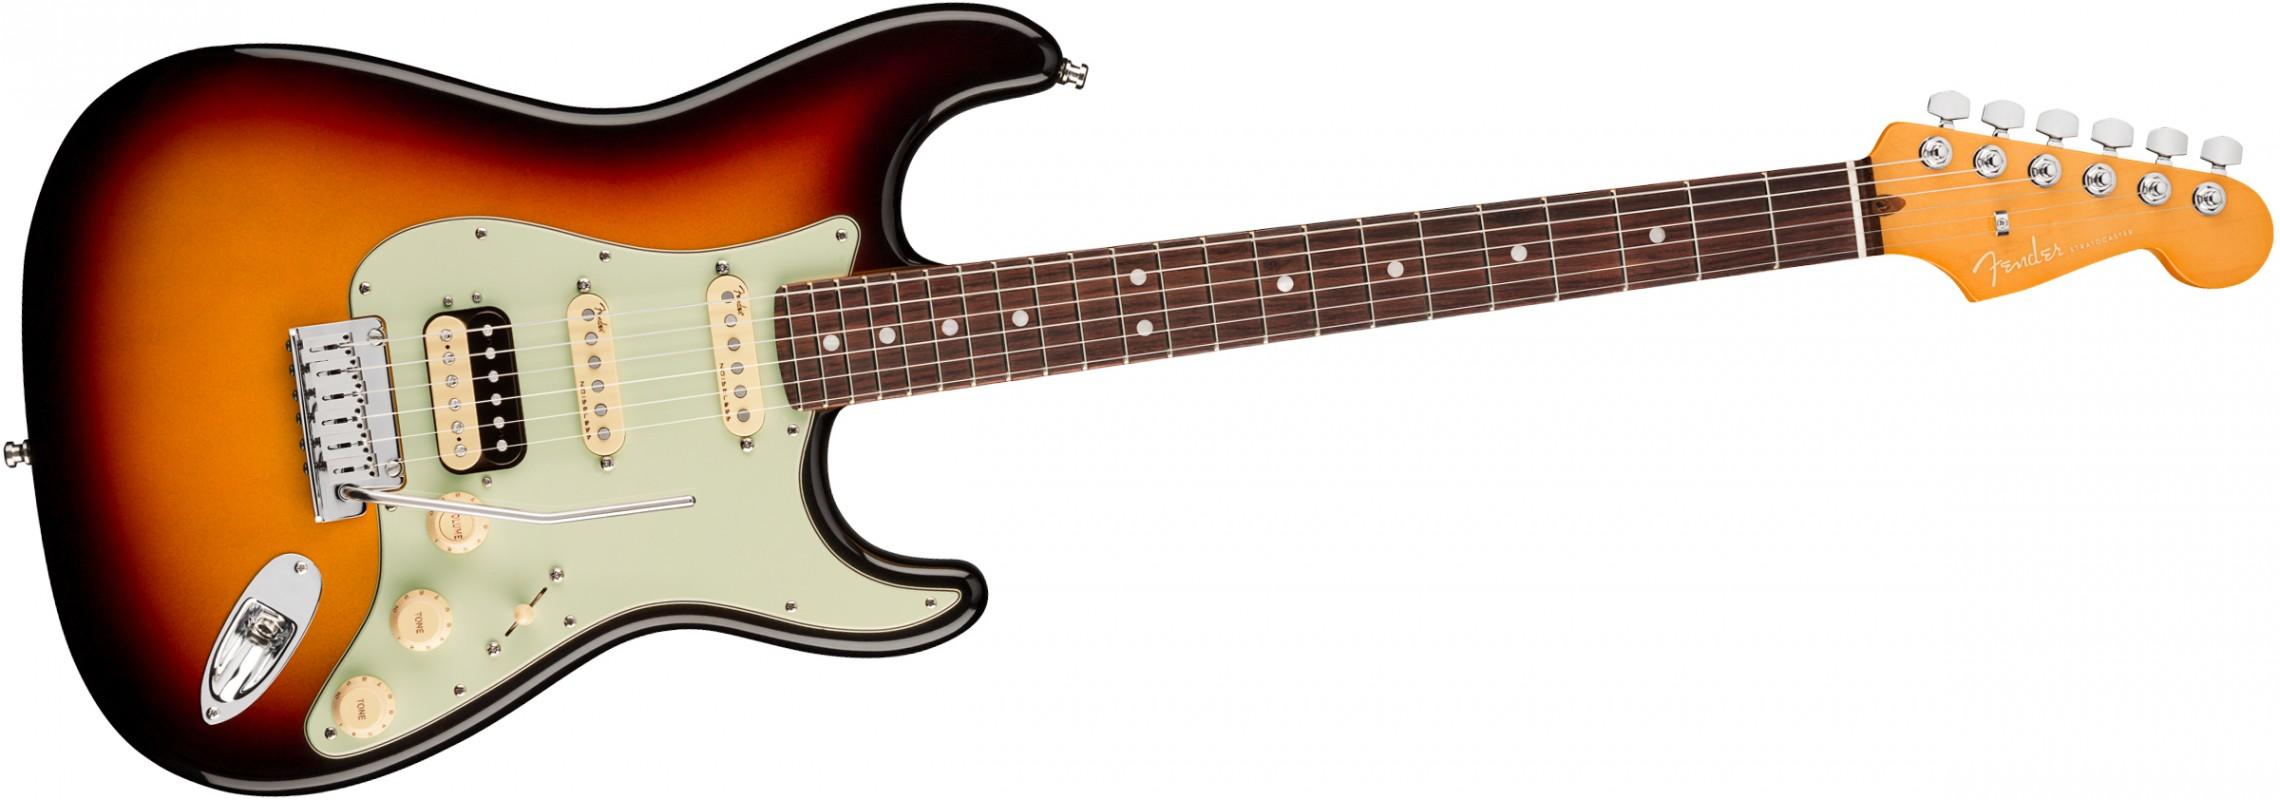 FENDER-American-Ultra-Stratocaster-HSS-RW-Ultraburst-0118020712-sku-23651